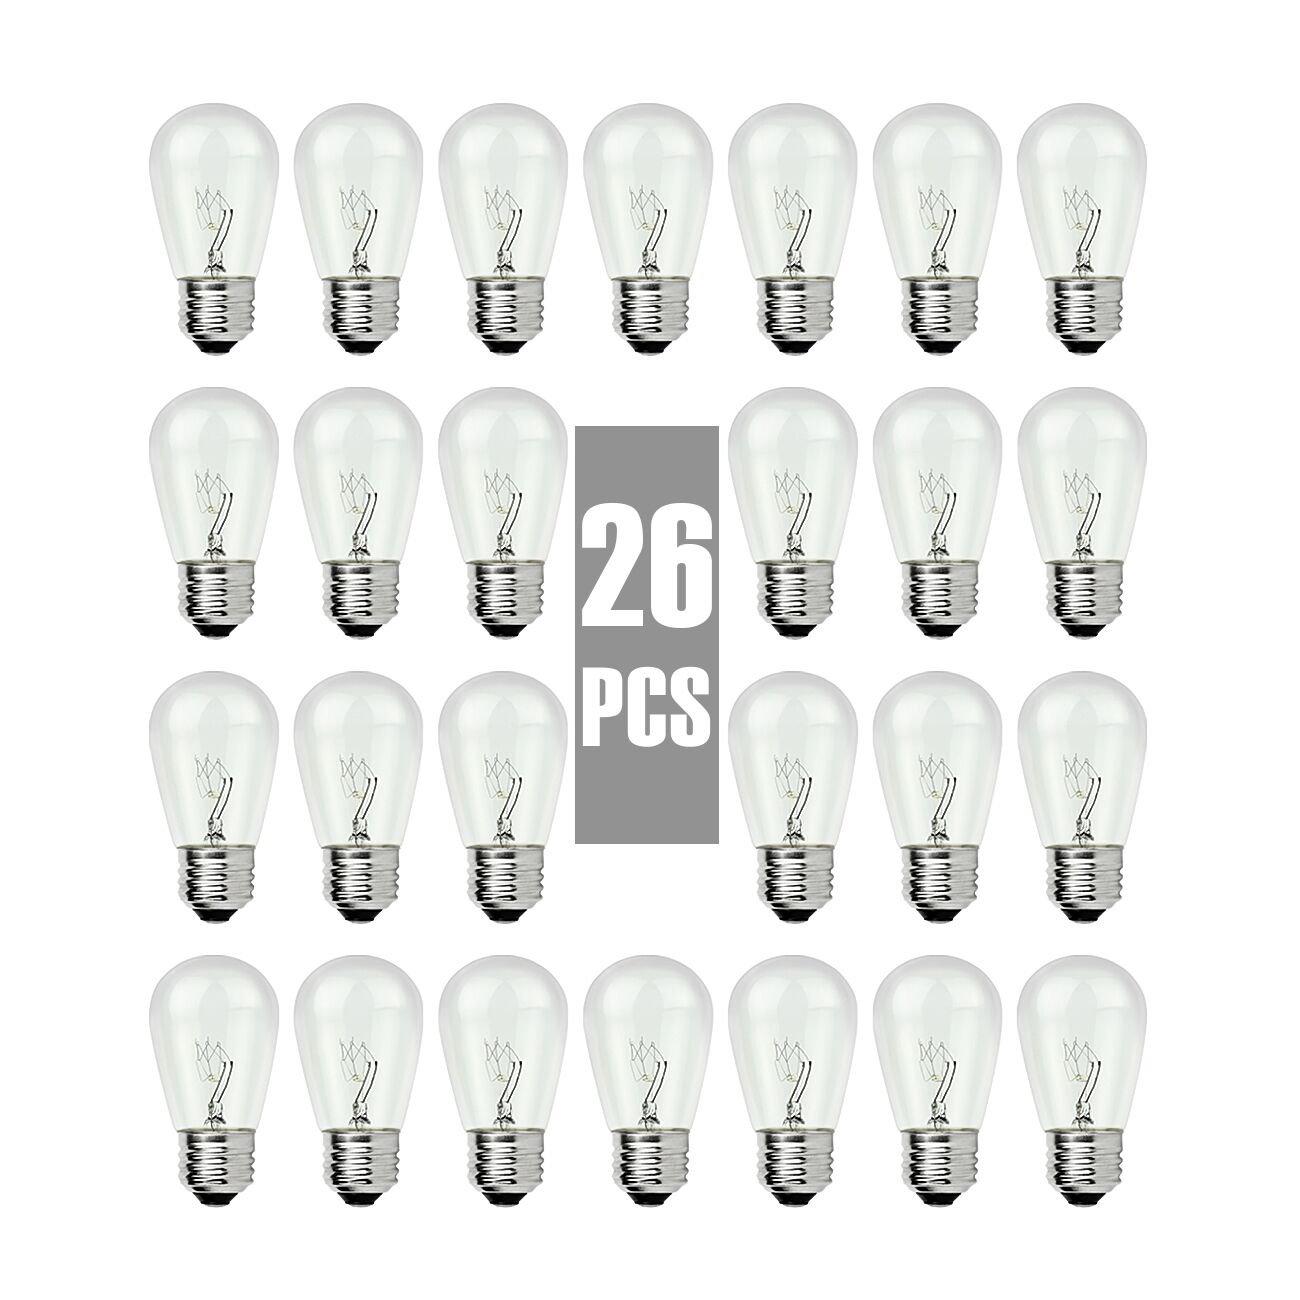 SHINE HAI E12 Candelabra LED Light Bulbs, 40W Equivalent, 2700K Daylight White B11 LED Candelabra Base, Non-Dimmable